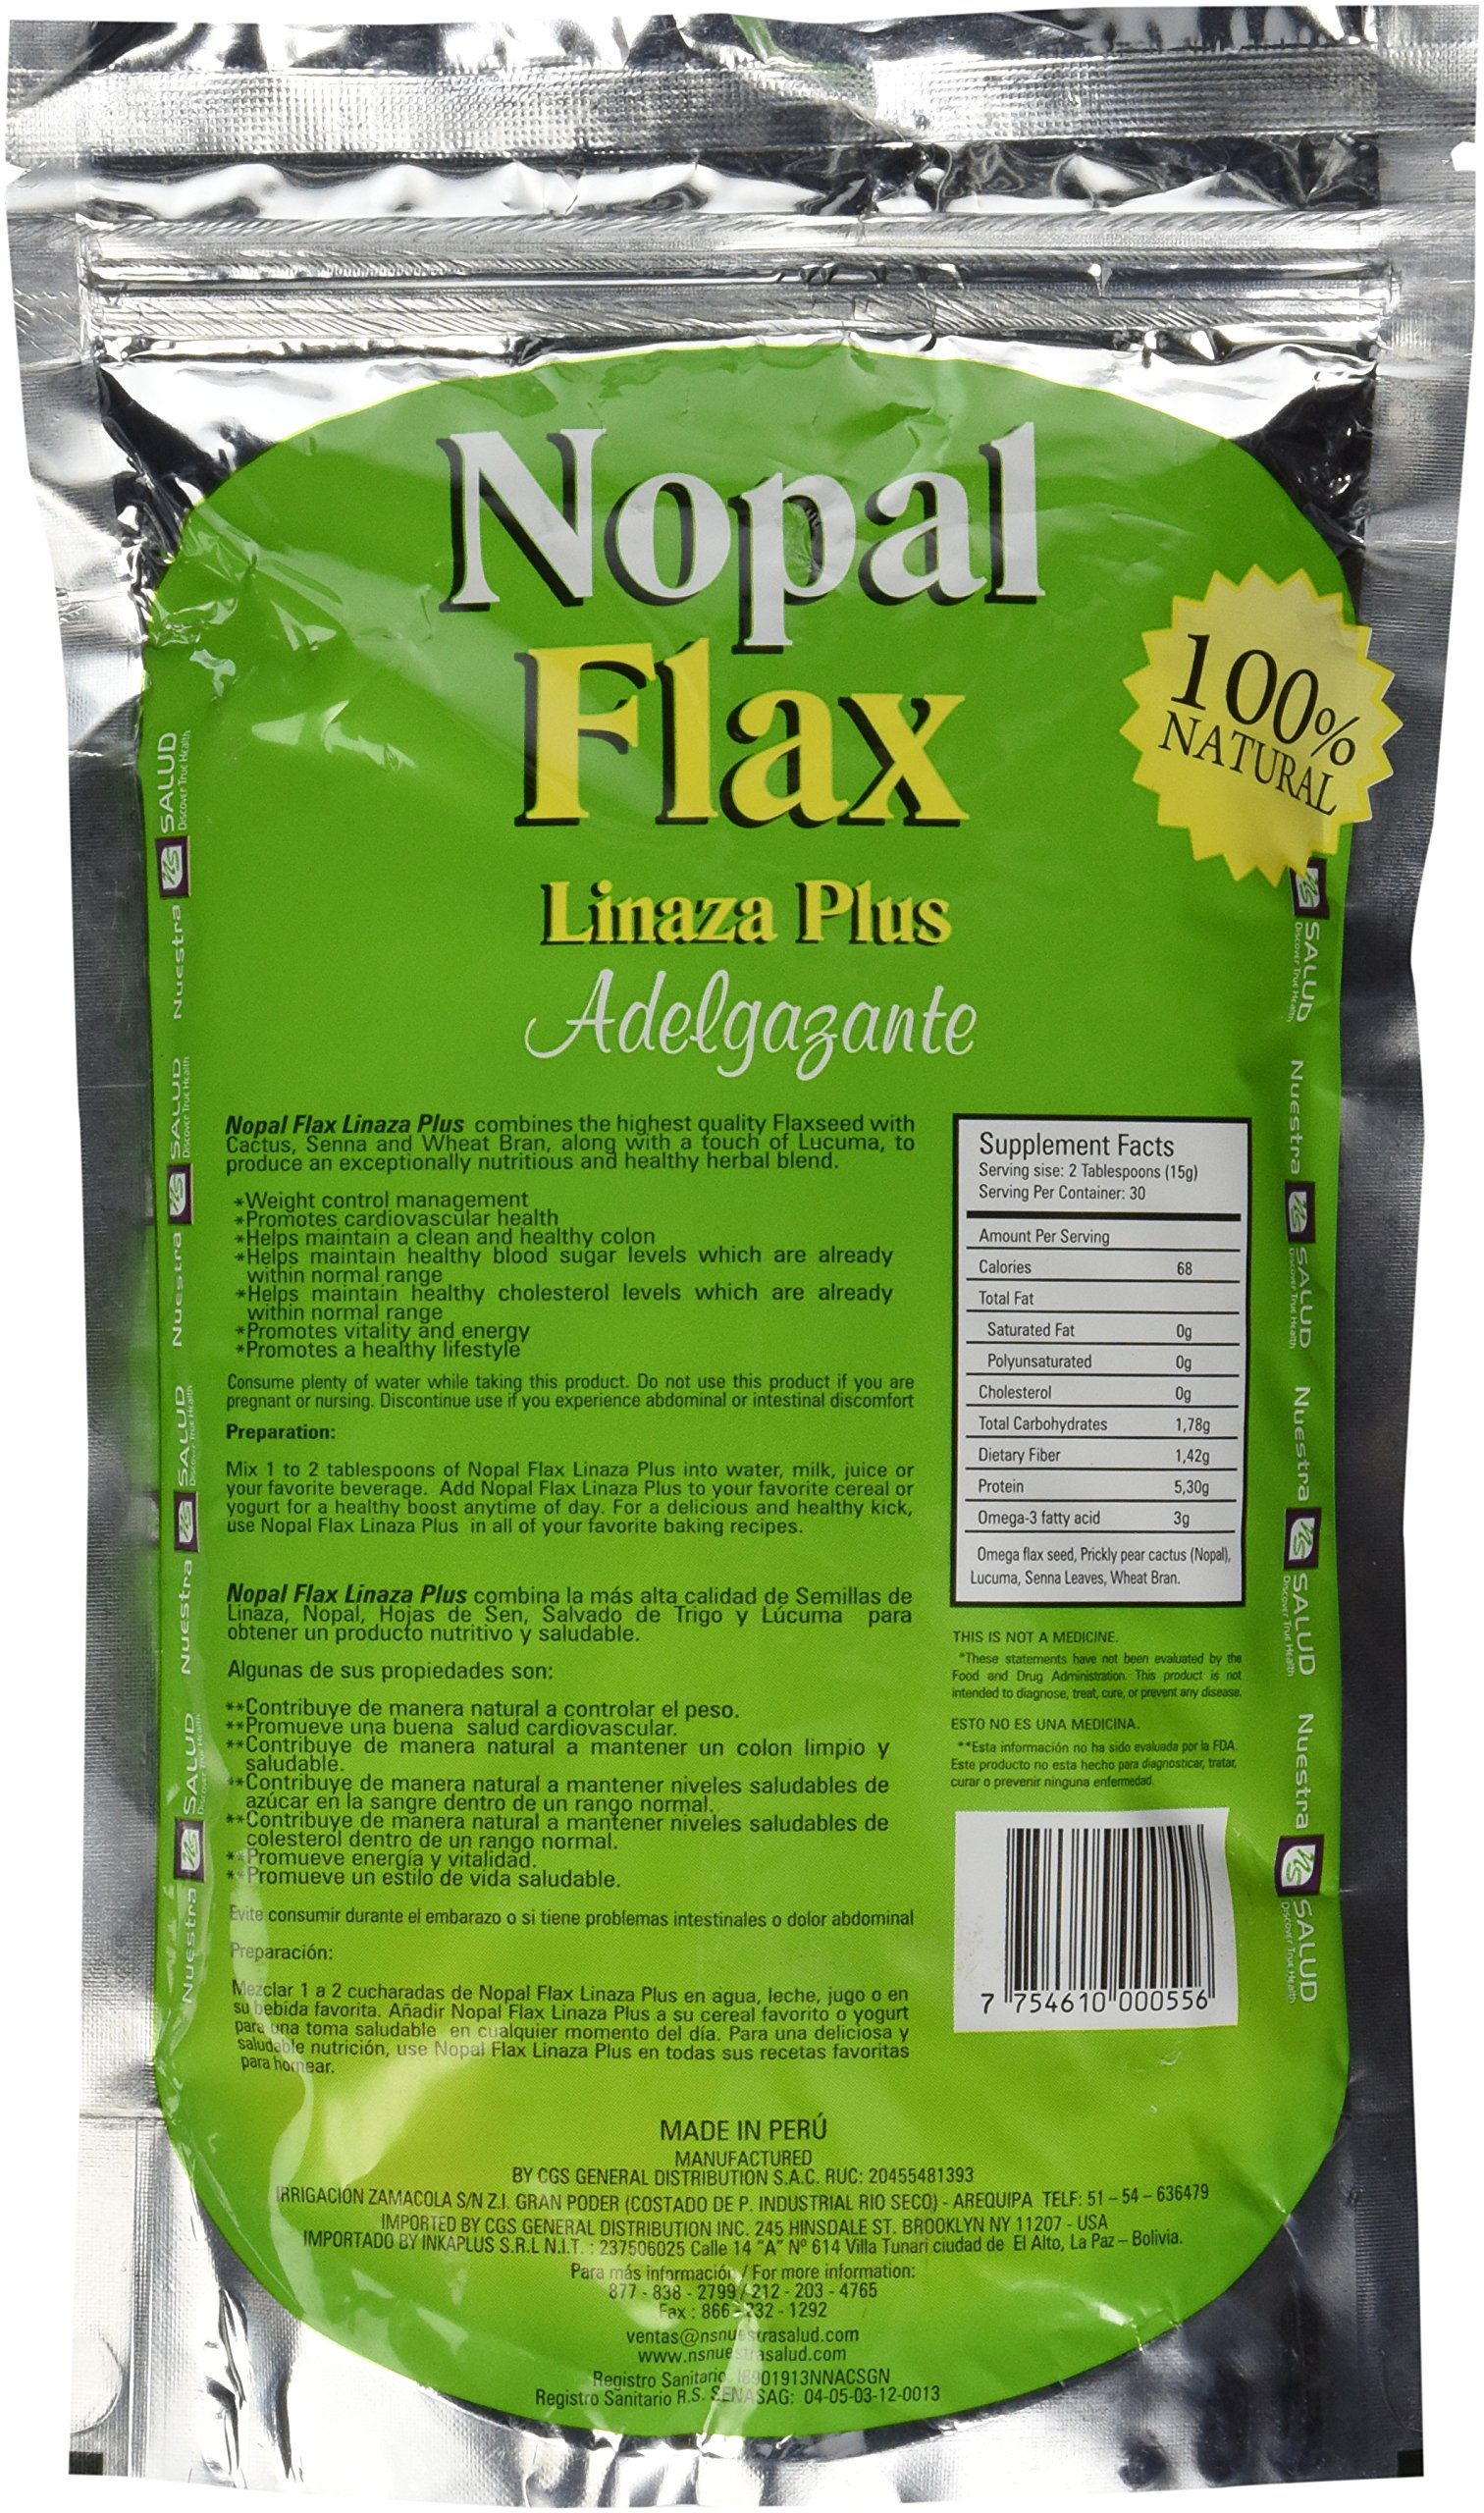 Nopal Flax Linaza Plus Adelgazante454 GR/1LB by Nuestra Salud (Image #4)